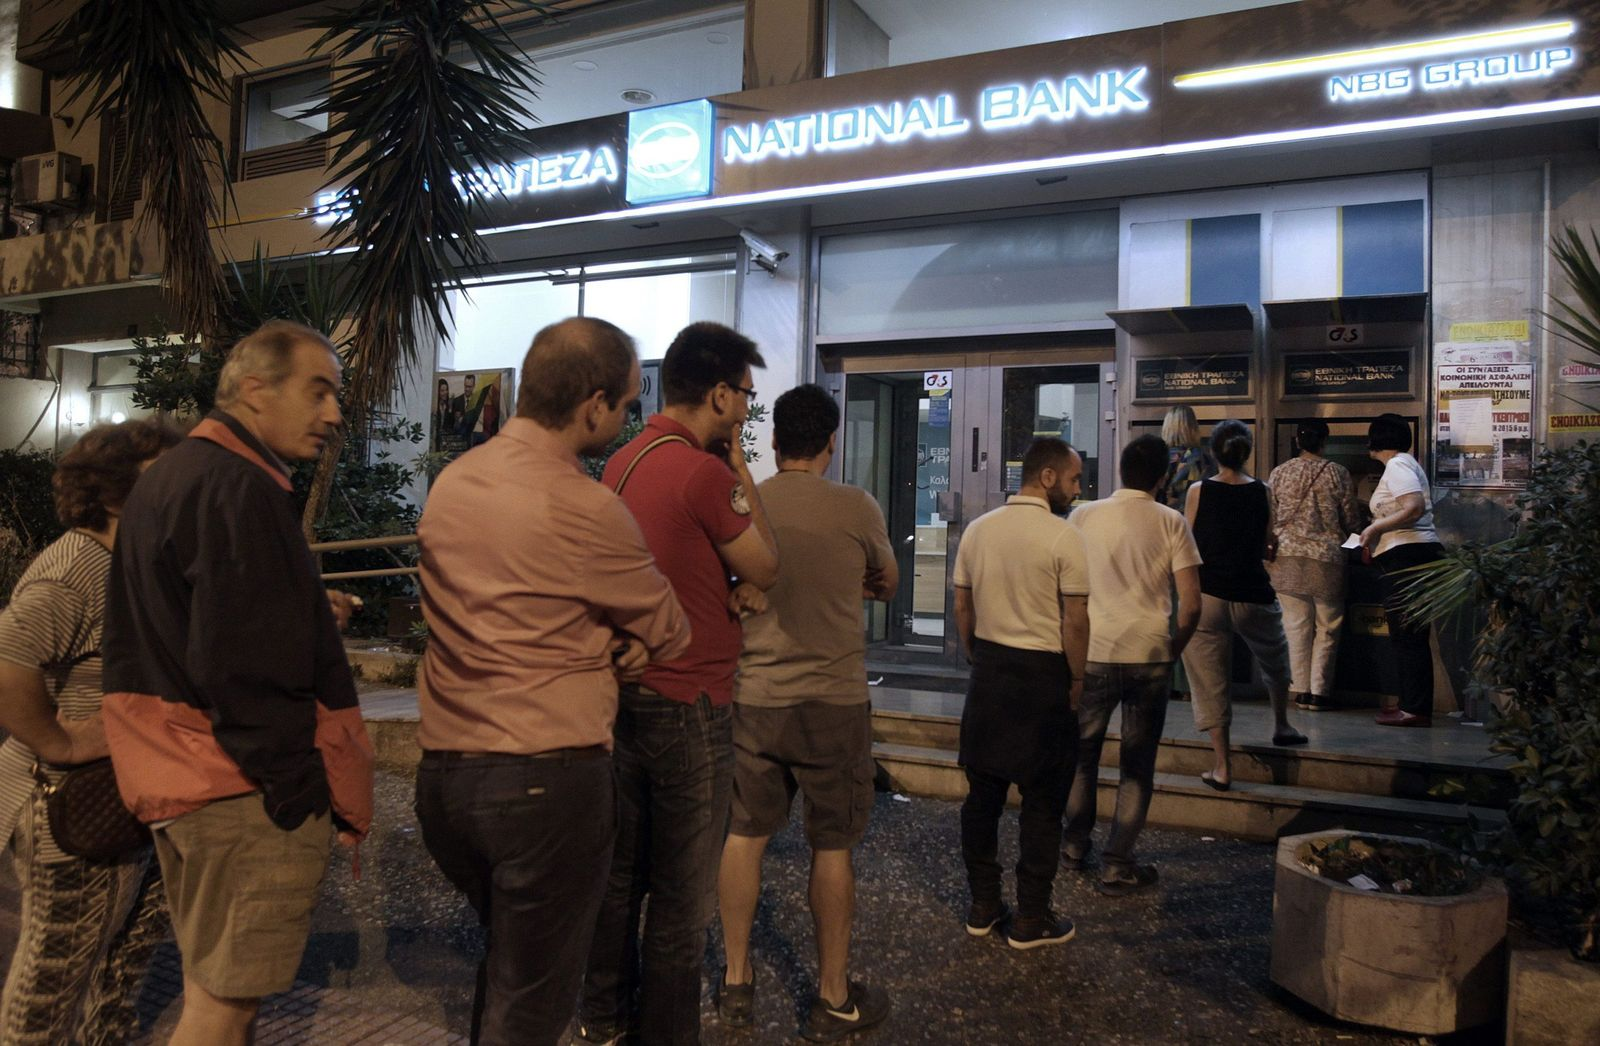 Griechenland/Geldautomat